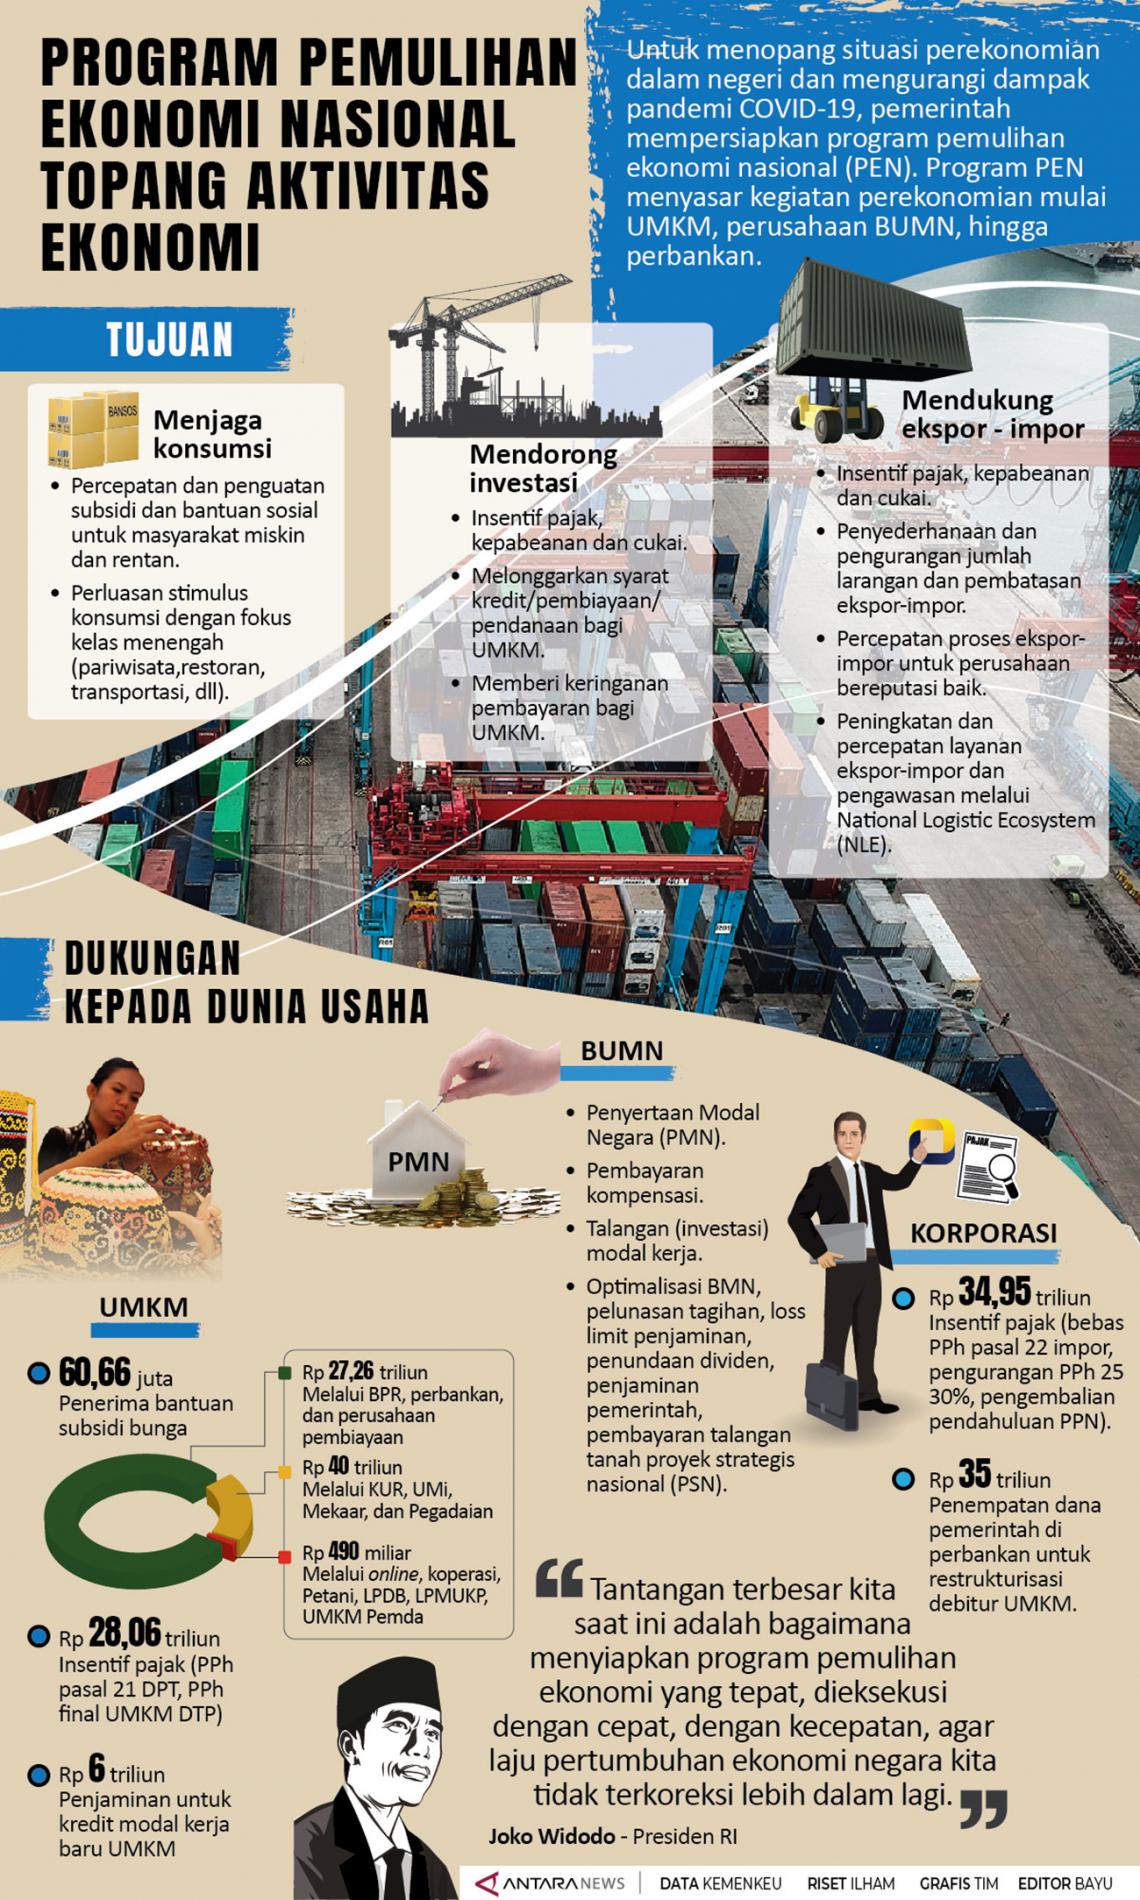 Anggaran Pemulihan Ekonomi hingga Awal November 2020 Baru Terserap Rp366,86 Triliun